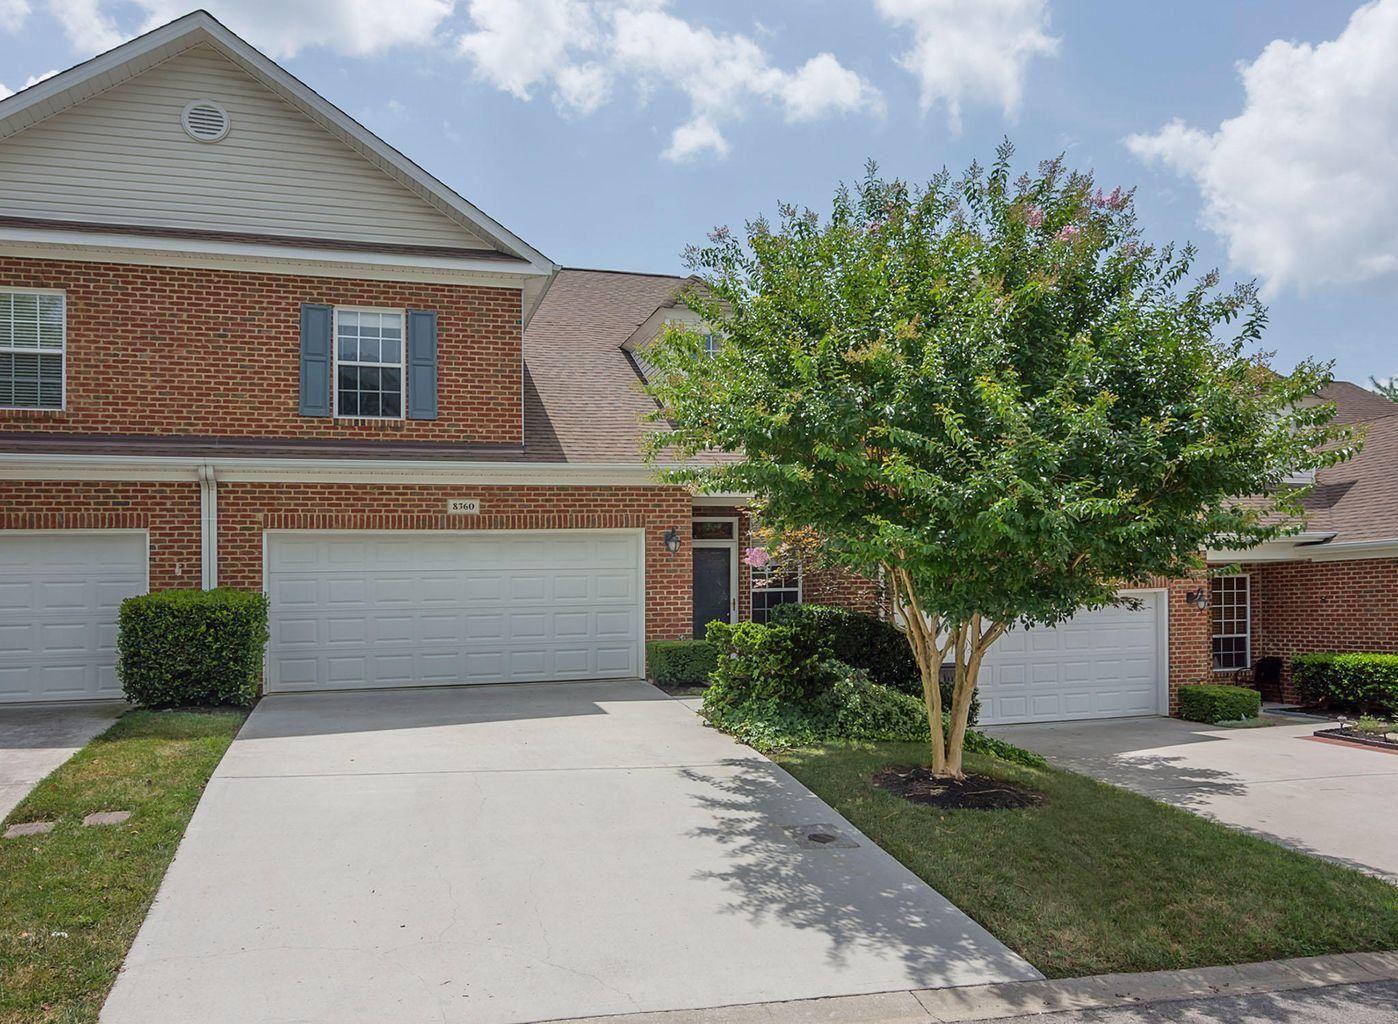 Photo of 8360 David Tippit Way, Knoxville, TN 37931 (MLS # 1162318)